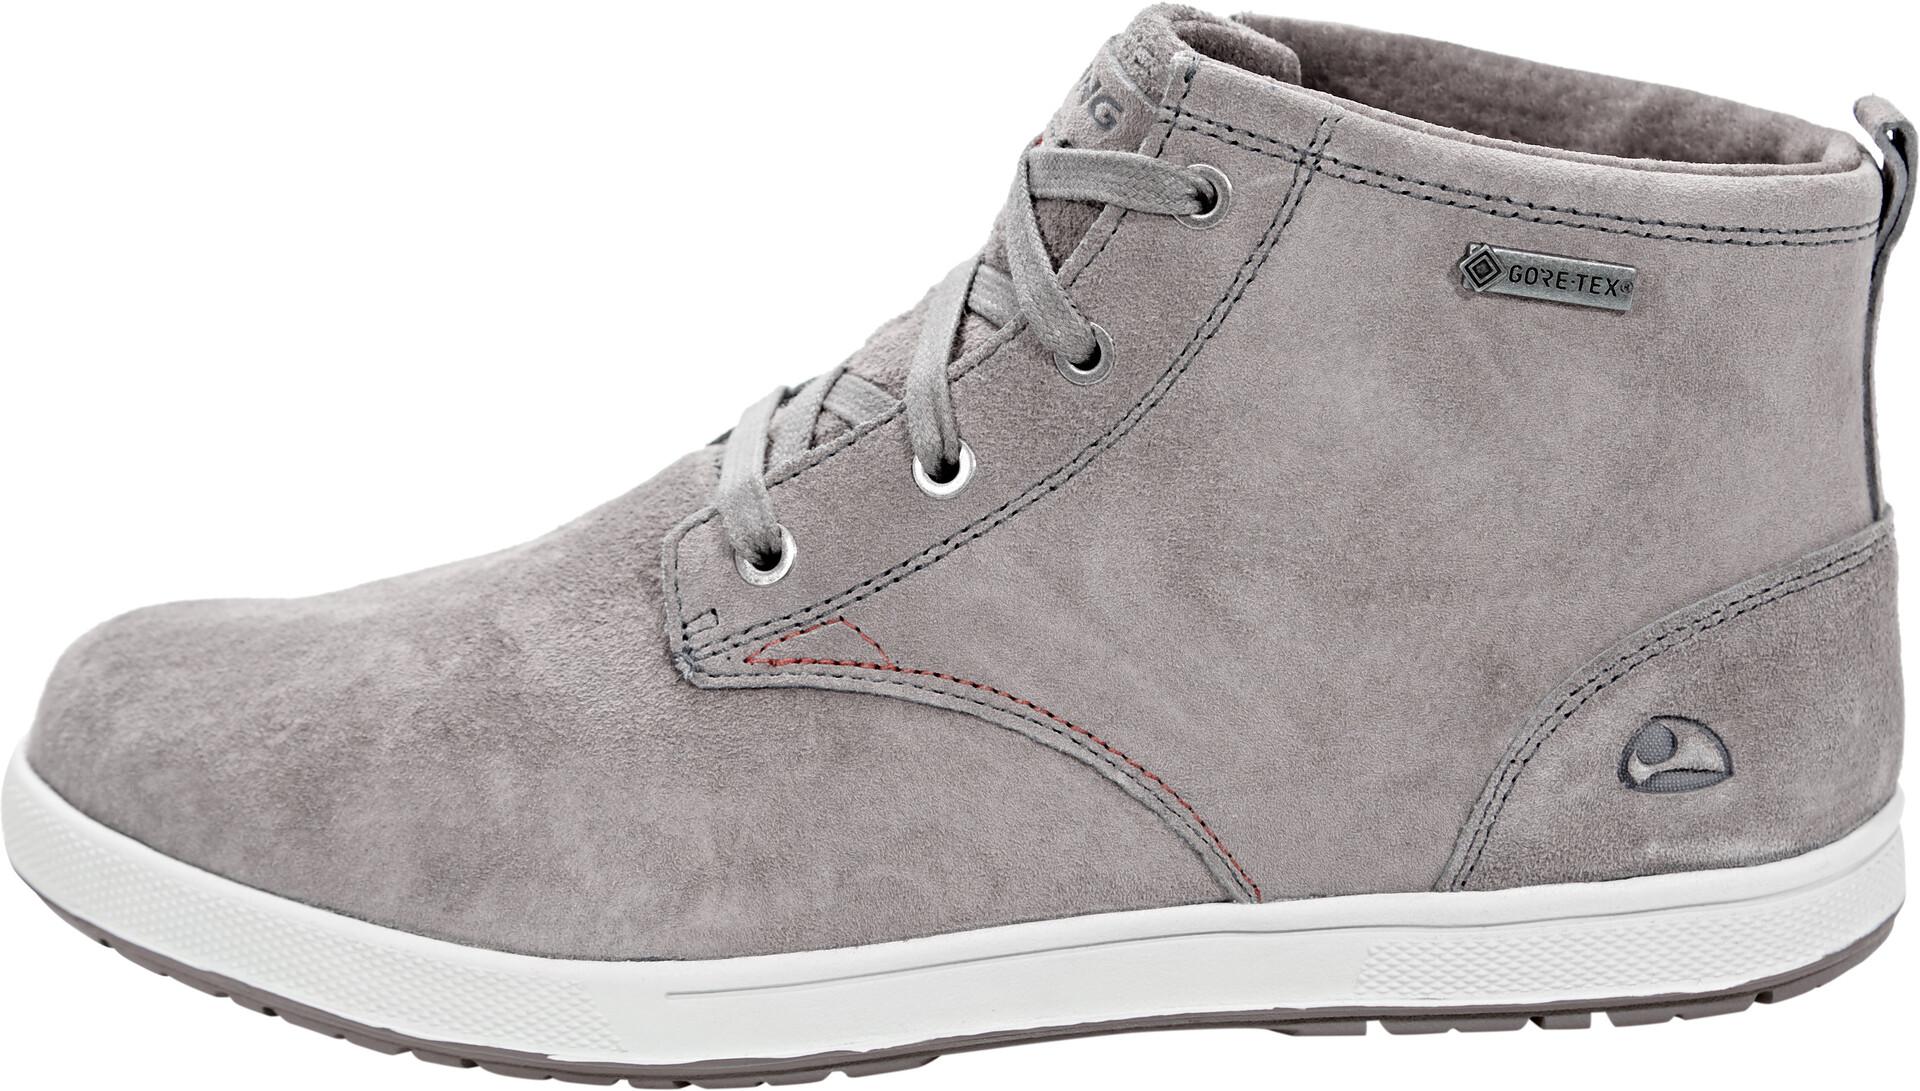 Footwear Calzado Sigrun Mujer Viking es GTX gris Campz SwUqdt